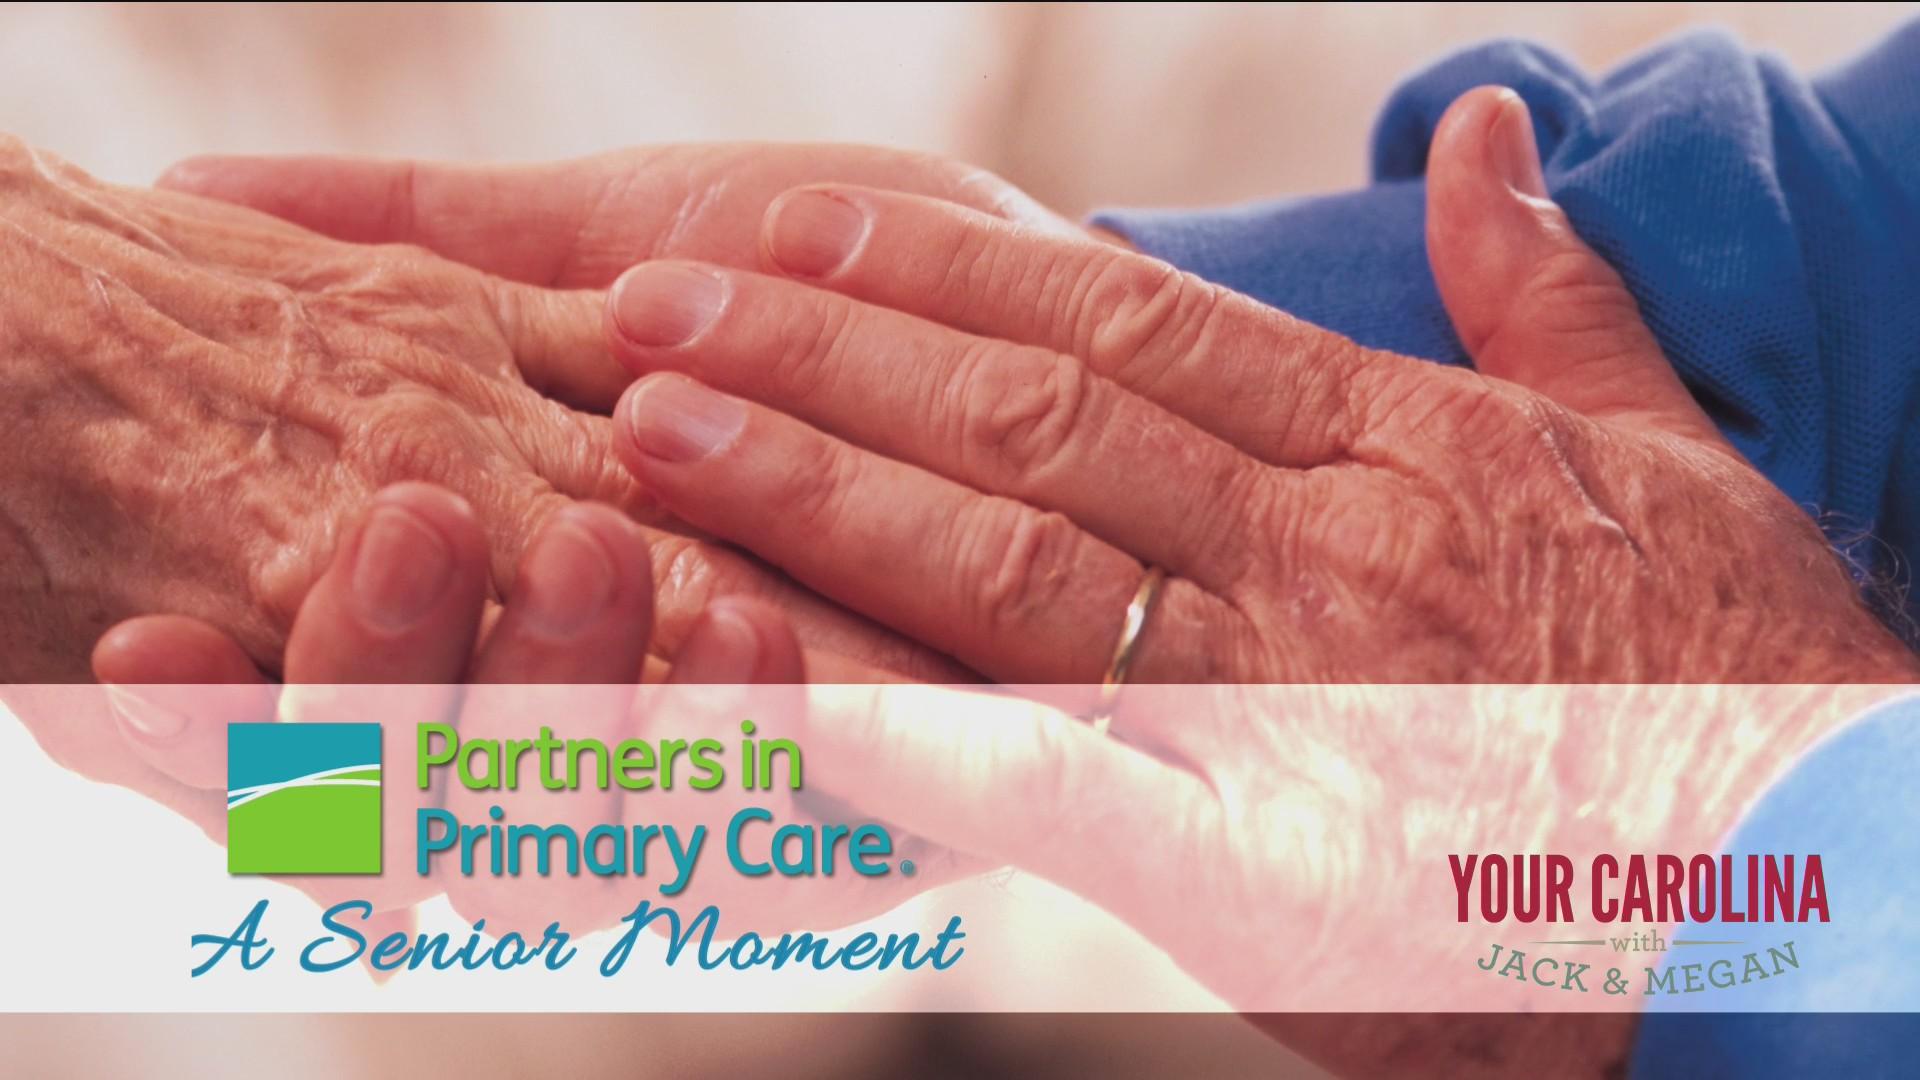 A Senior Moment - High Blood Pressure